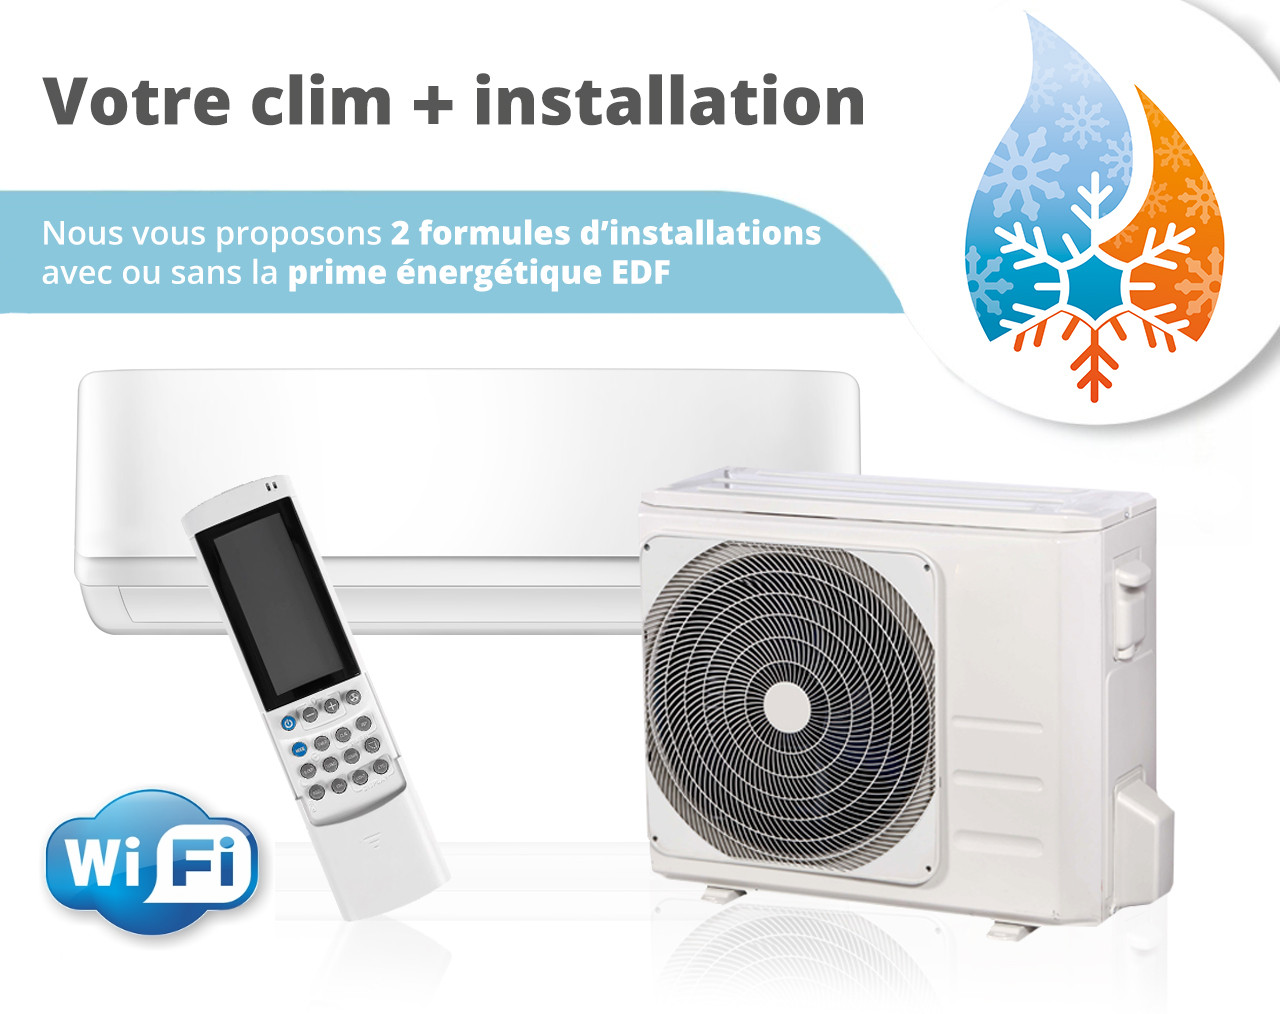 clim-installation-wifi